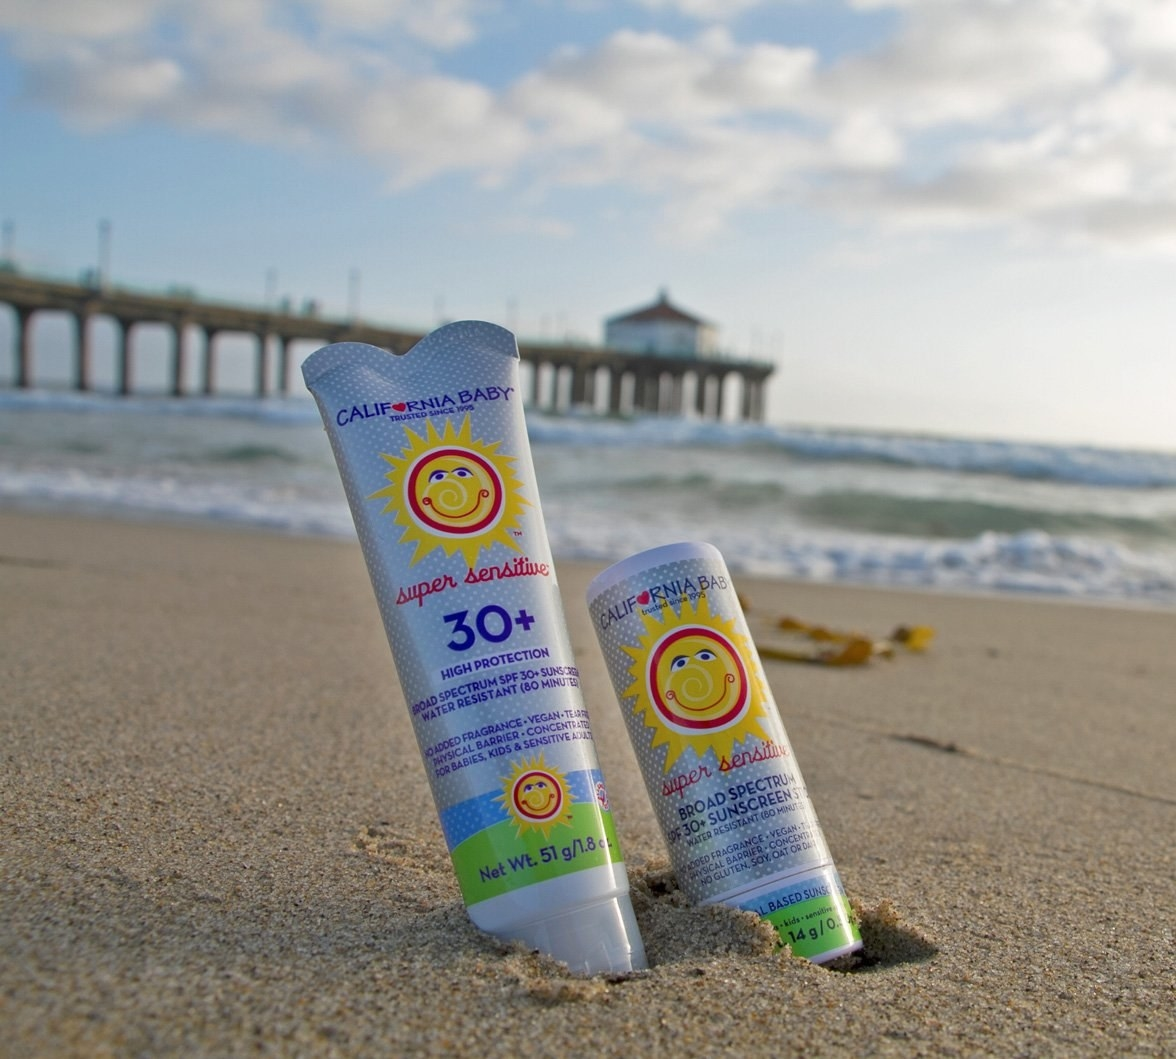 bottle of california baby super sensitive SPF 30+ sunscreen on the beach